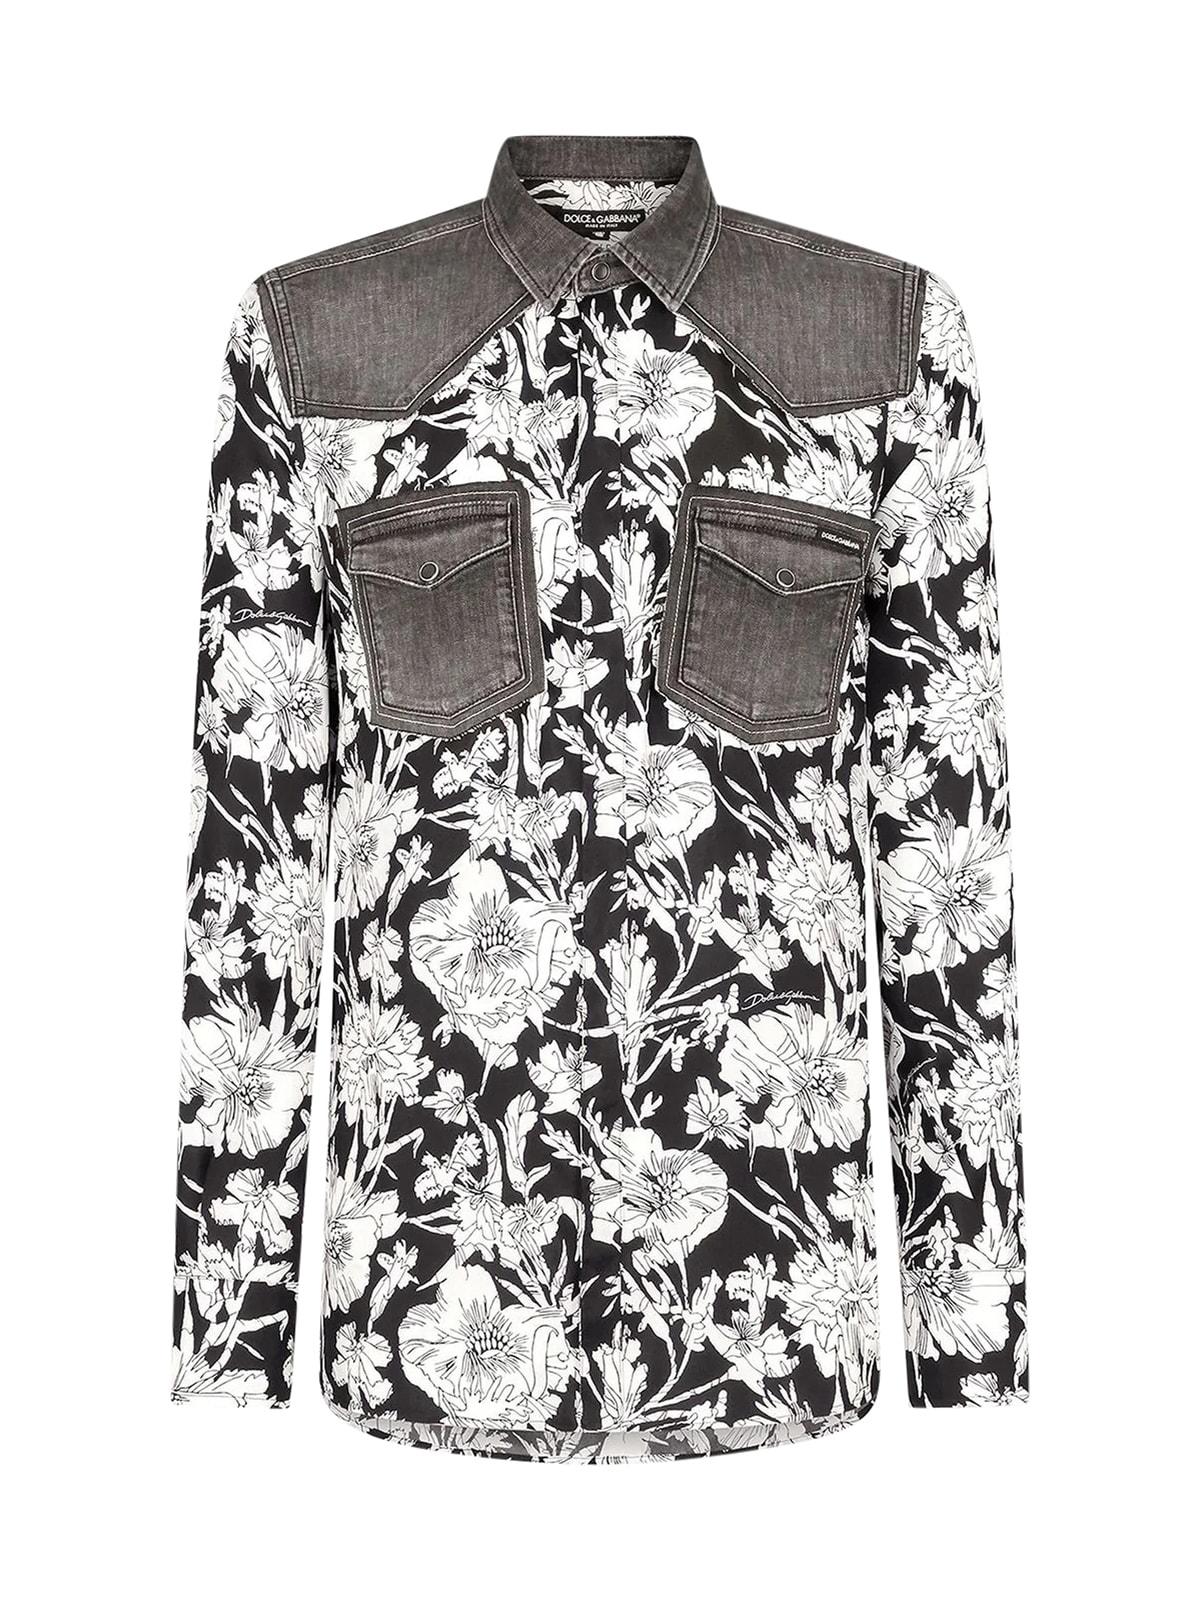 Dolce & Gabbana Silks SHIRT FLOWERS